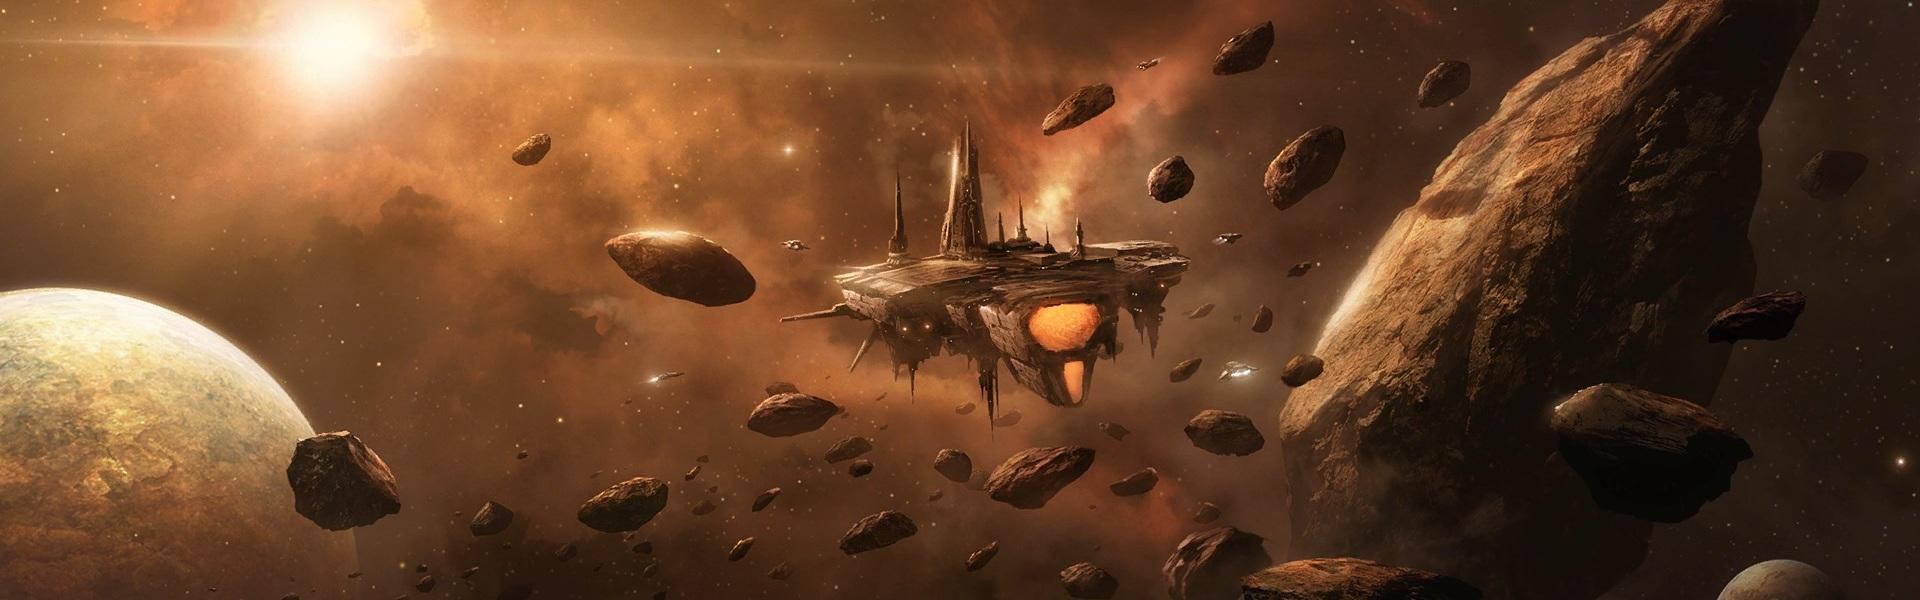 Stellaris: Apocalypse (DLC) Steam Key GLOBAL